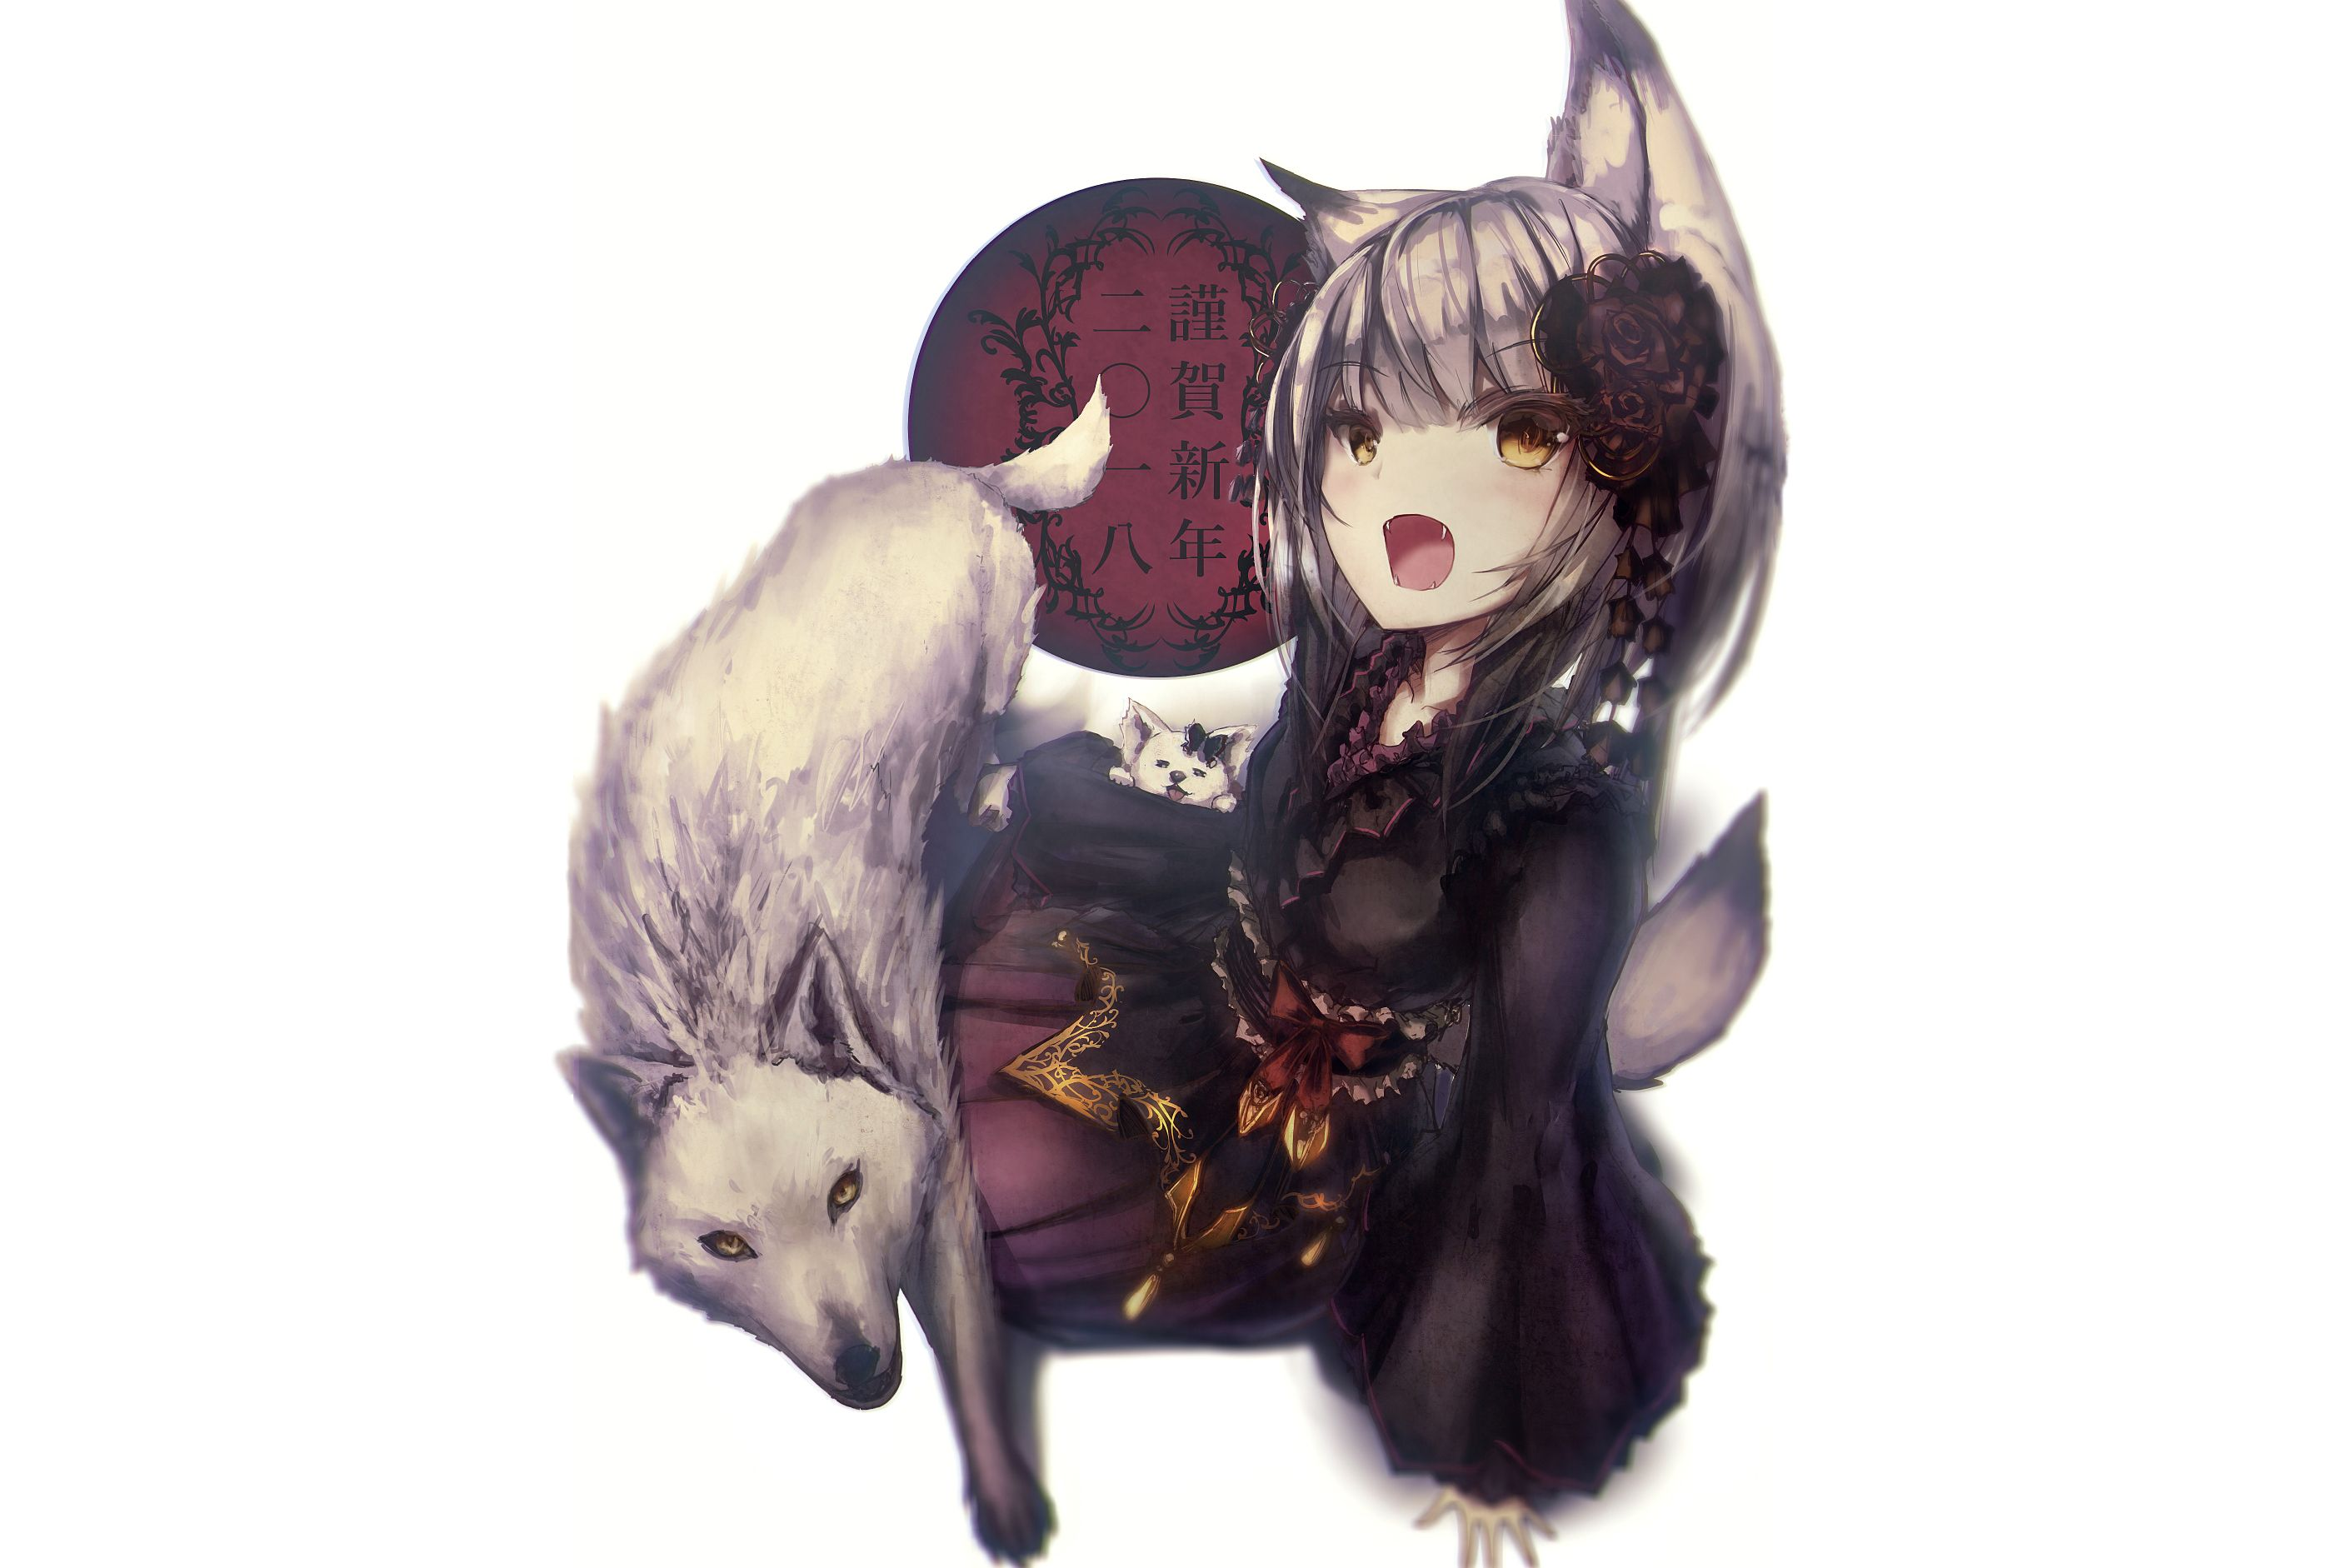 Anime 2823x1882 Anime Anime Girls Original Characters Animals Wolf Wolf Girls White Background Yellow Eyes O Animals Artwork Fox Illustration Animals Beautiful